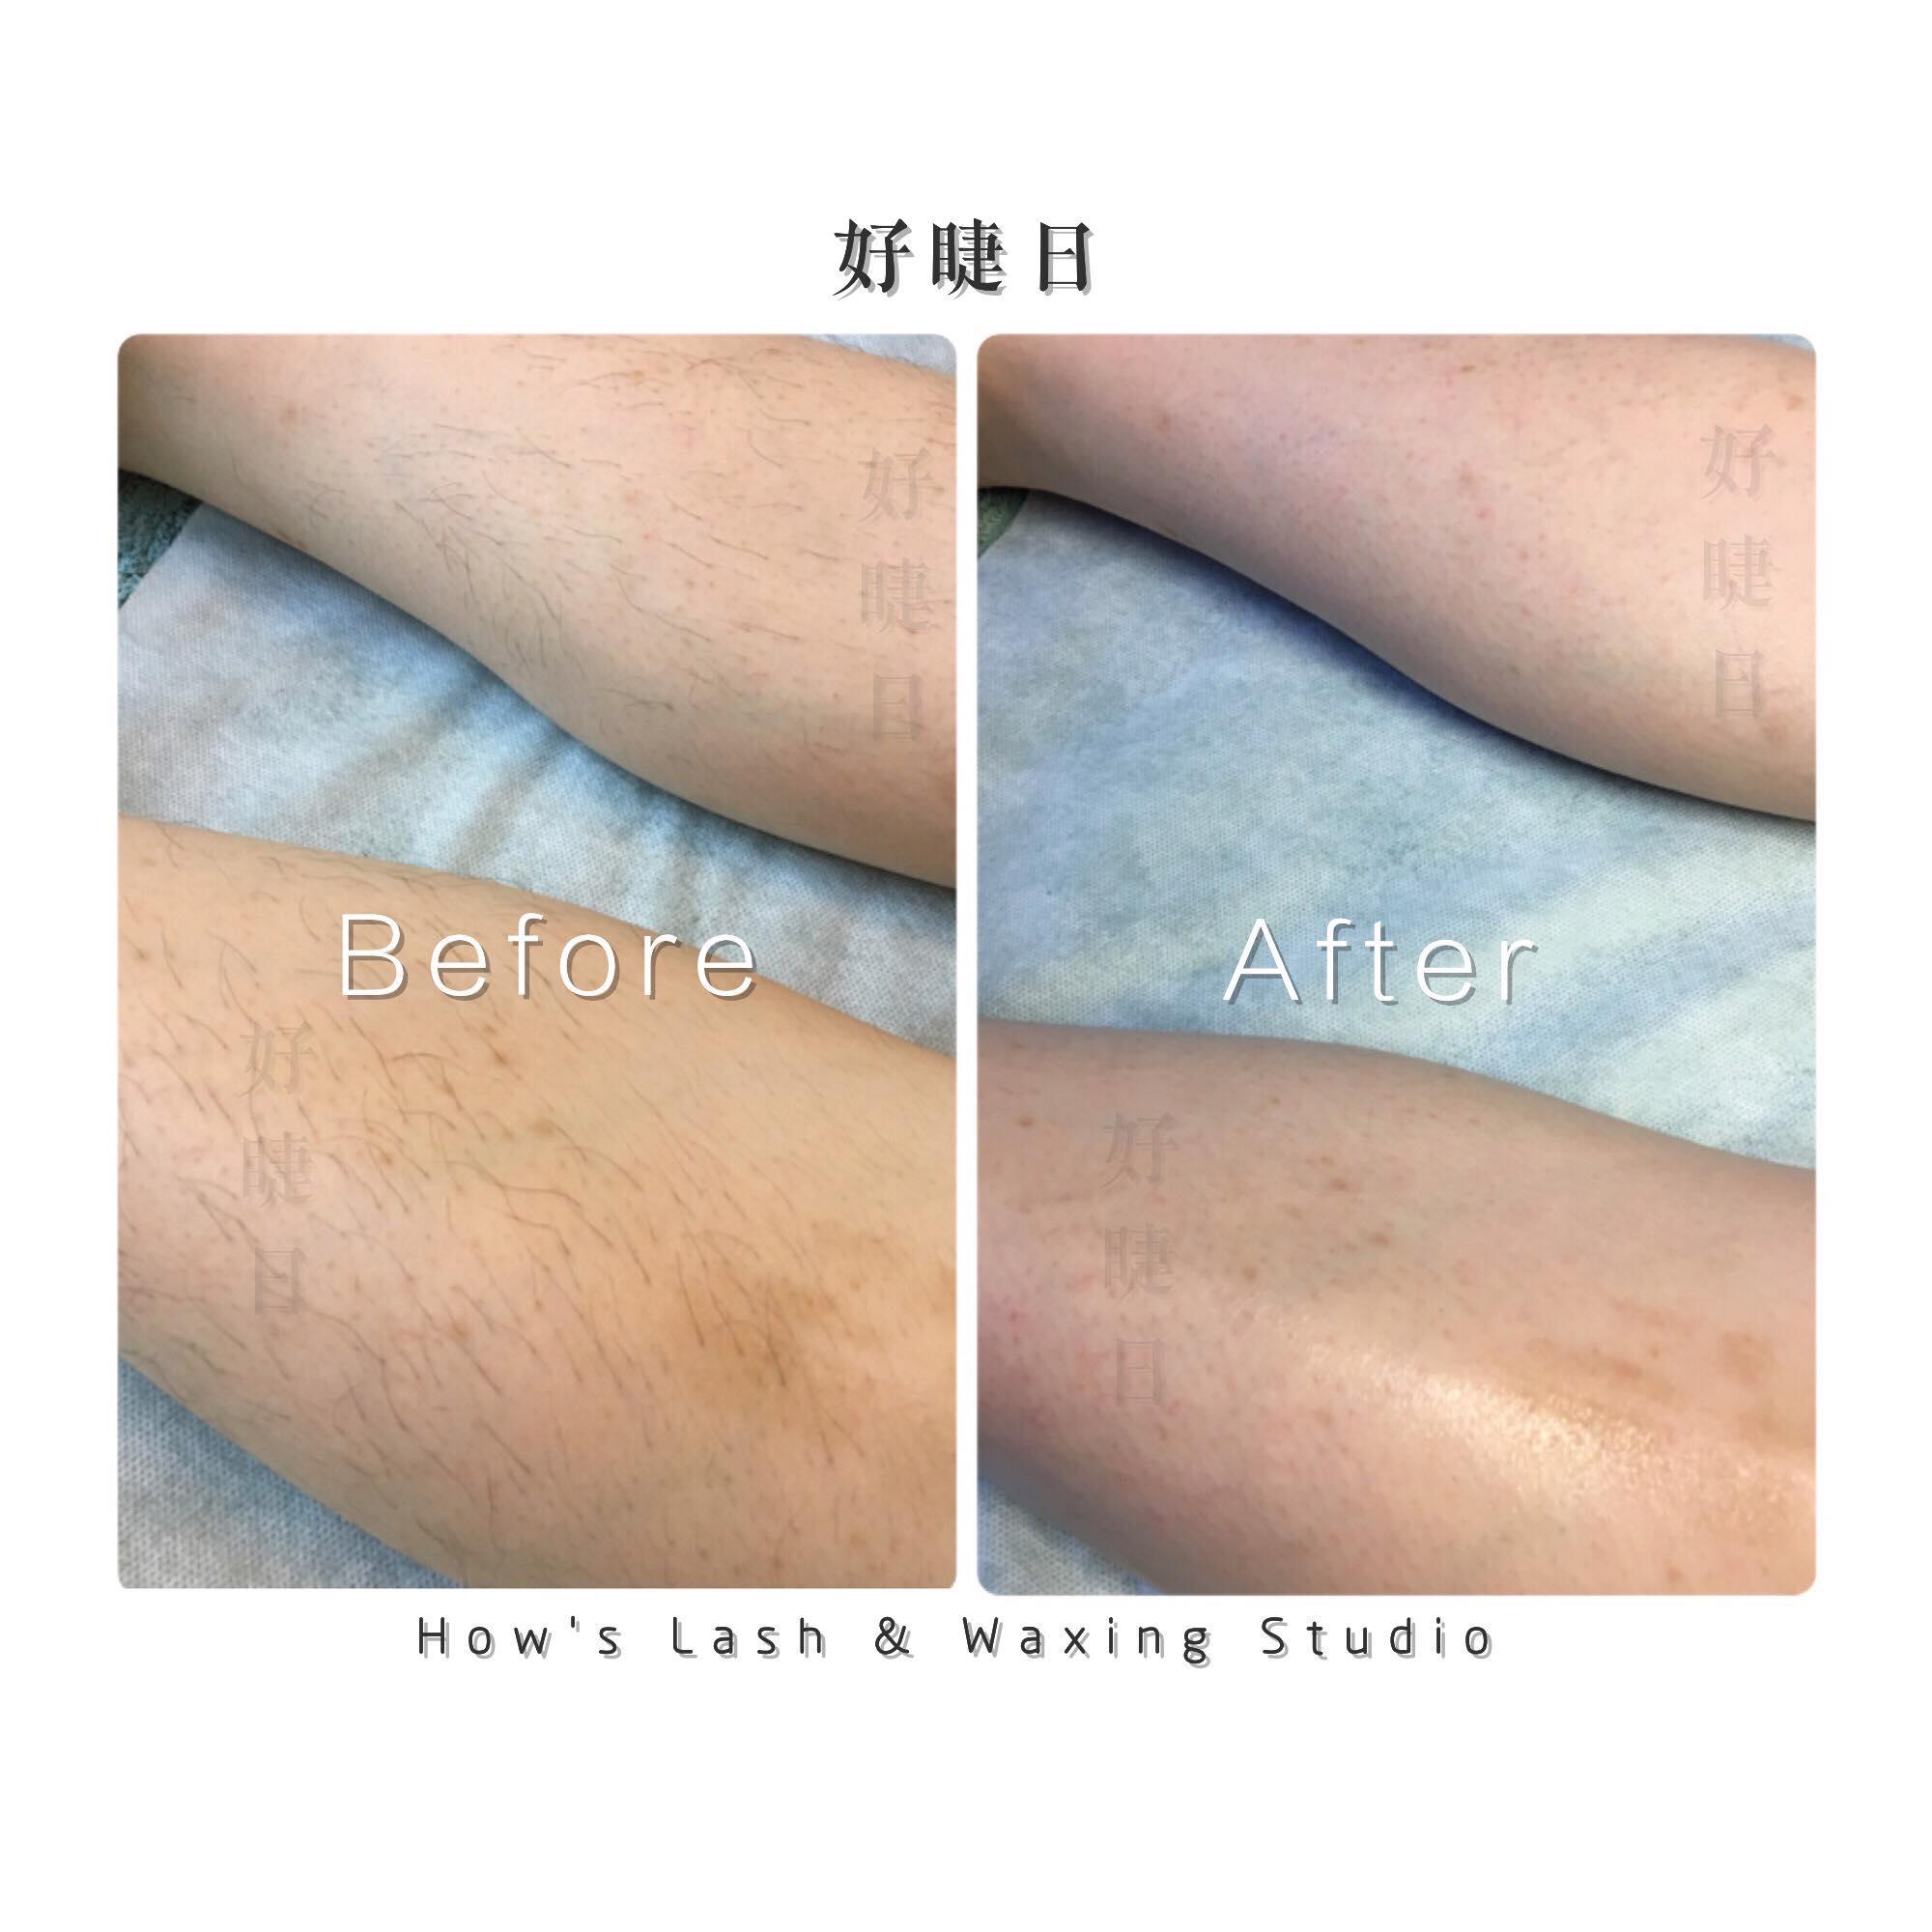 小腿|Lower Leg